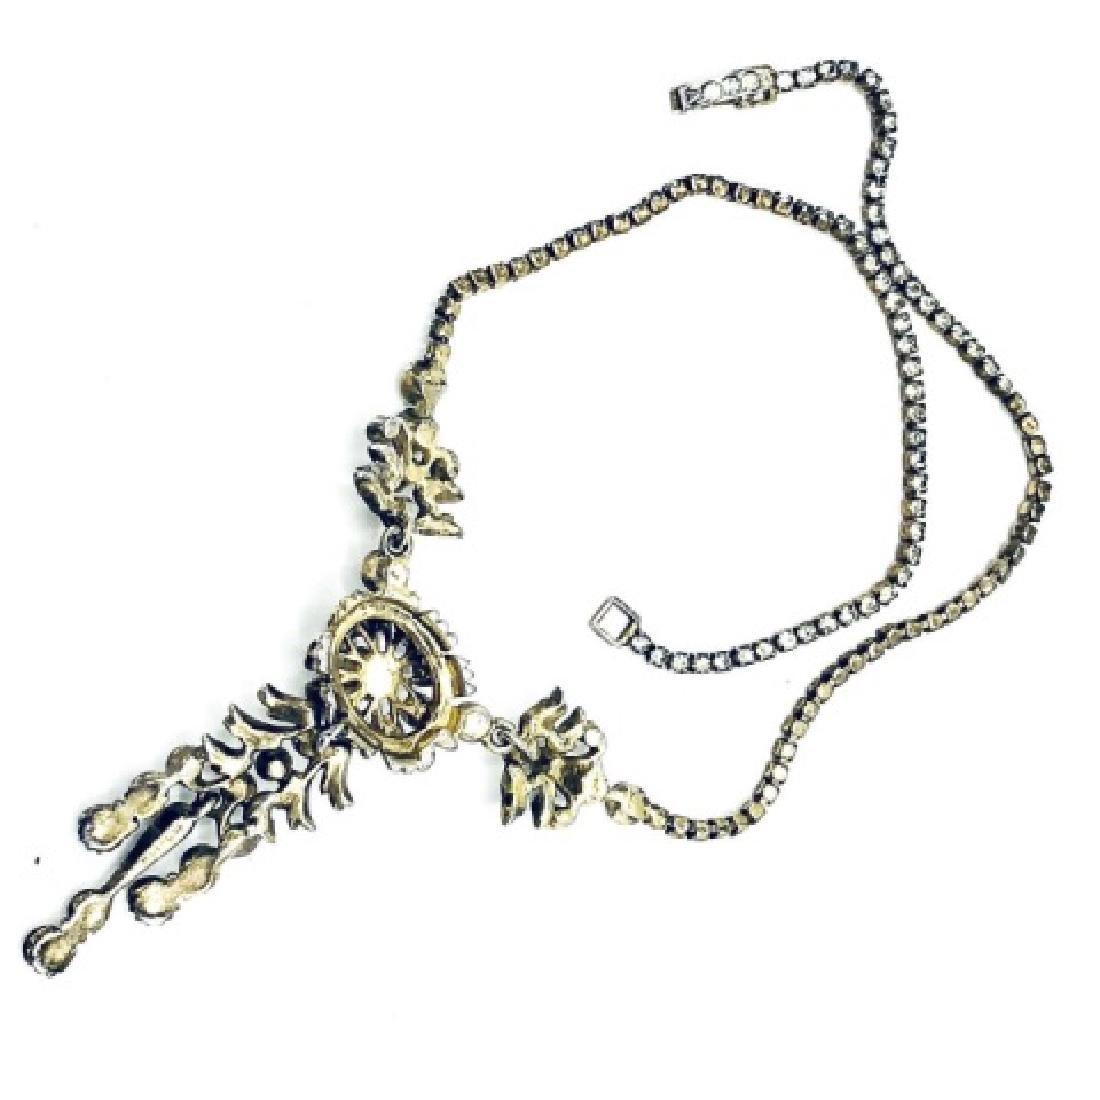 DeRosa Sterling & Rhinestone Floral Necklace - 2